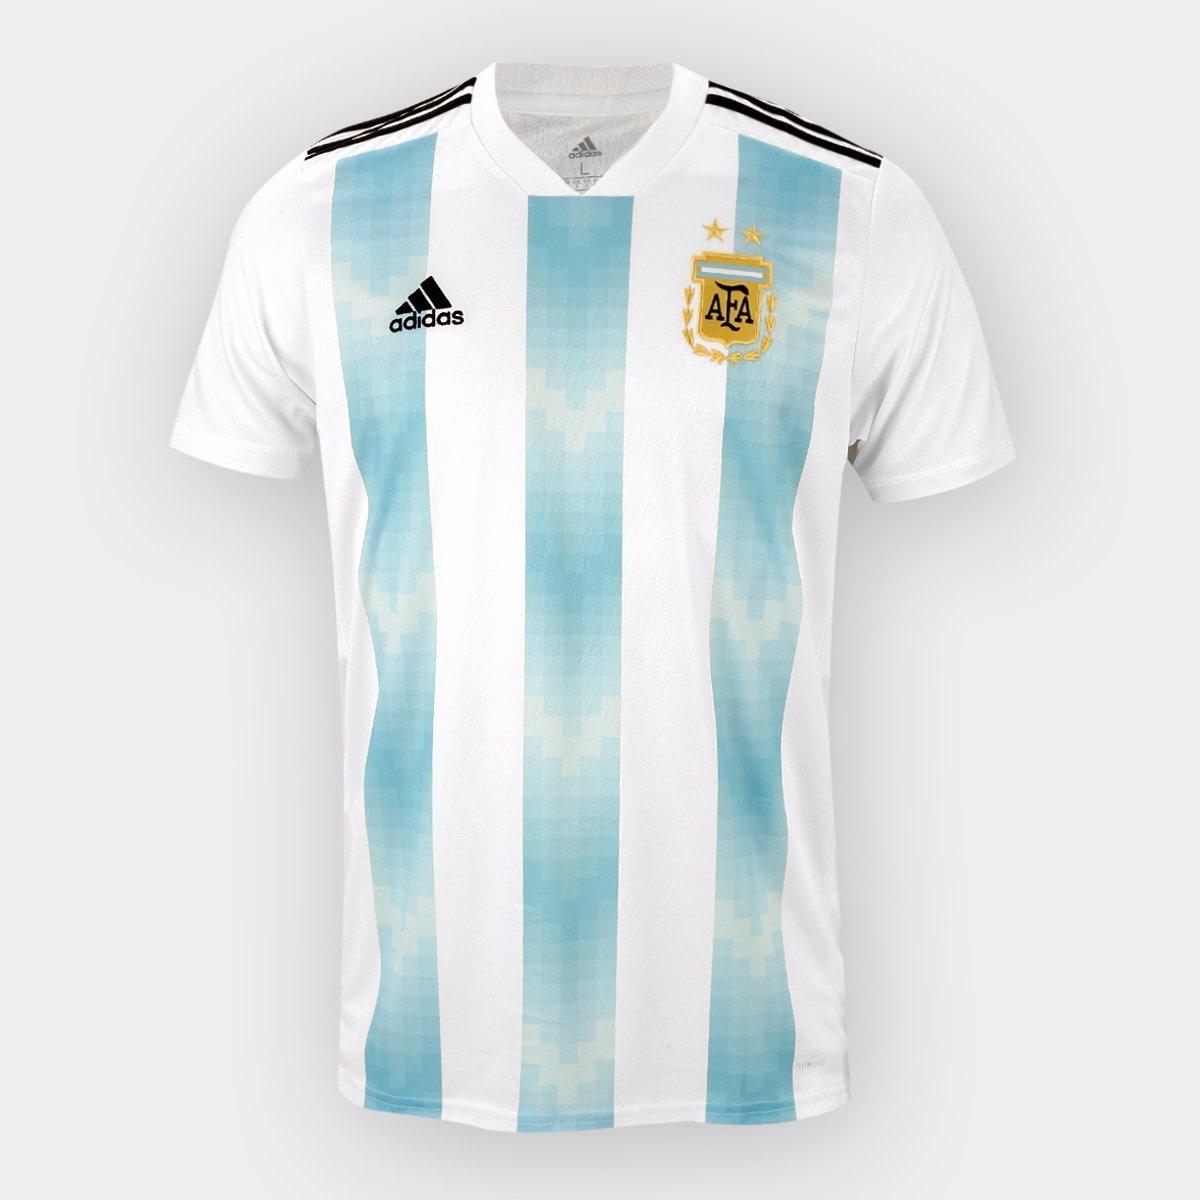 Opiniones tragaperra Wonderland afa seleccion argentina-734685